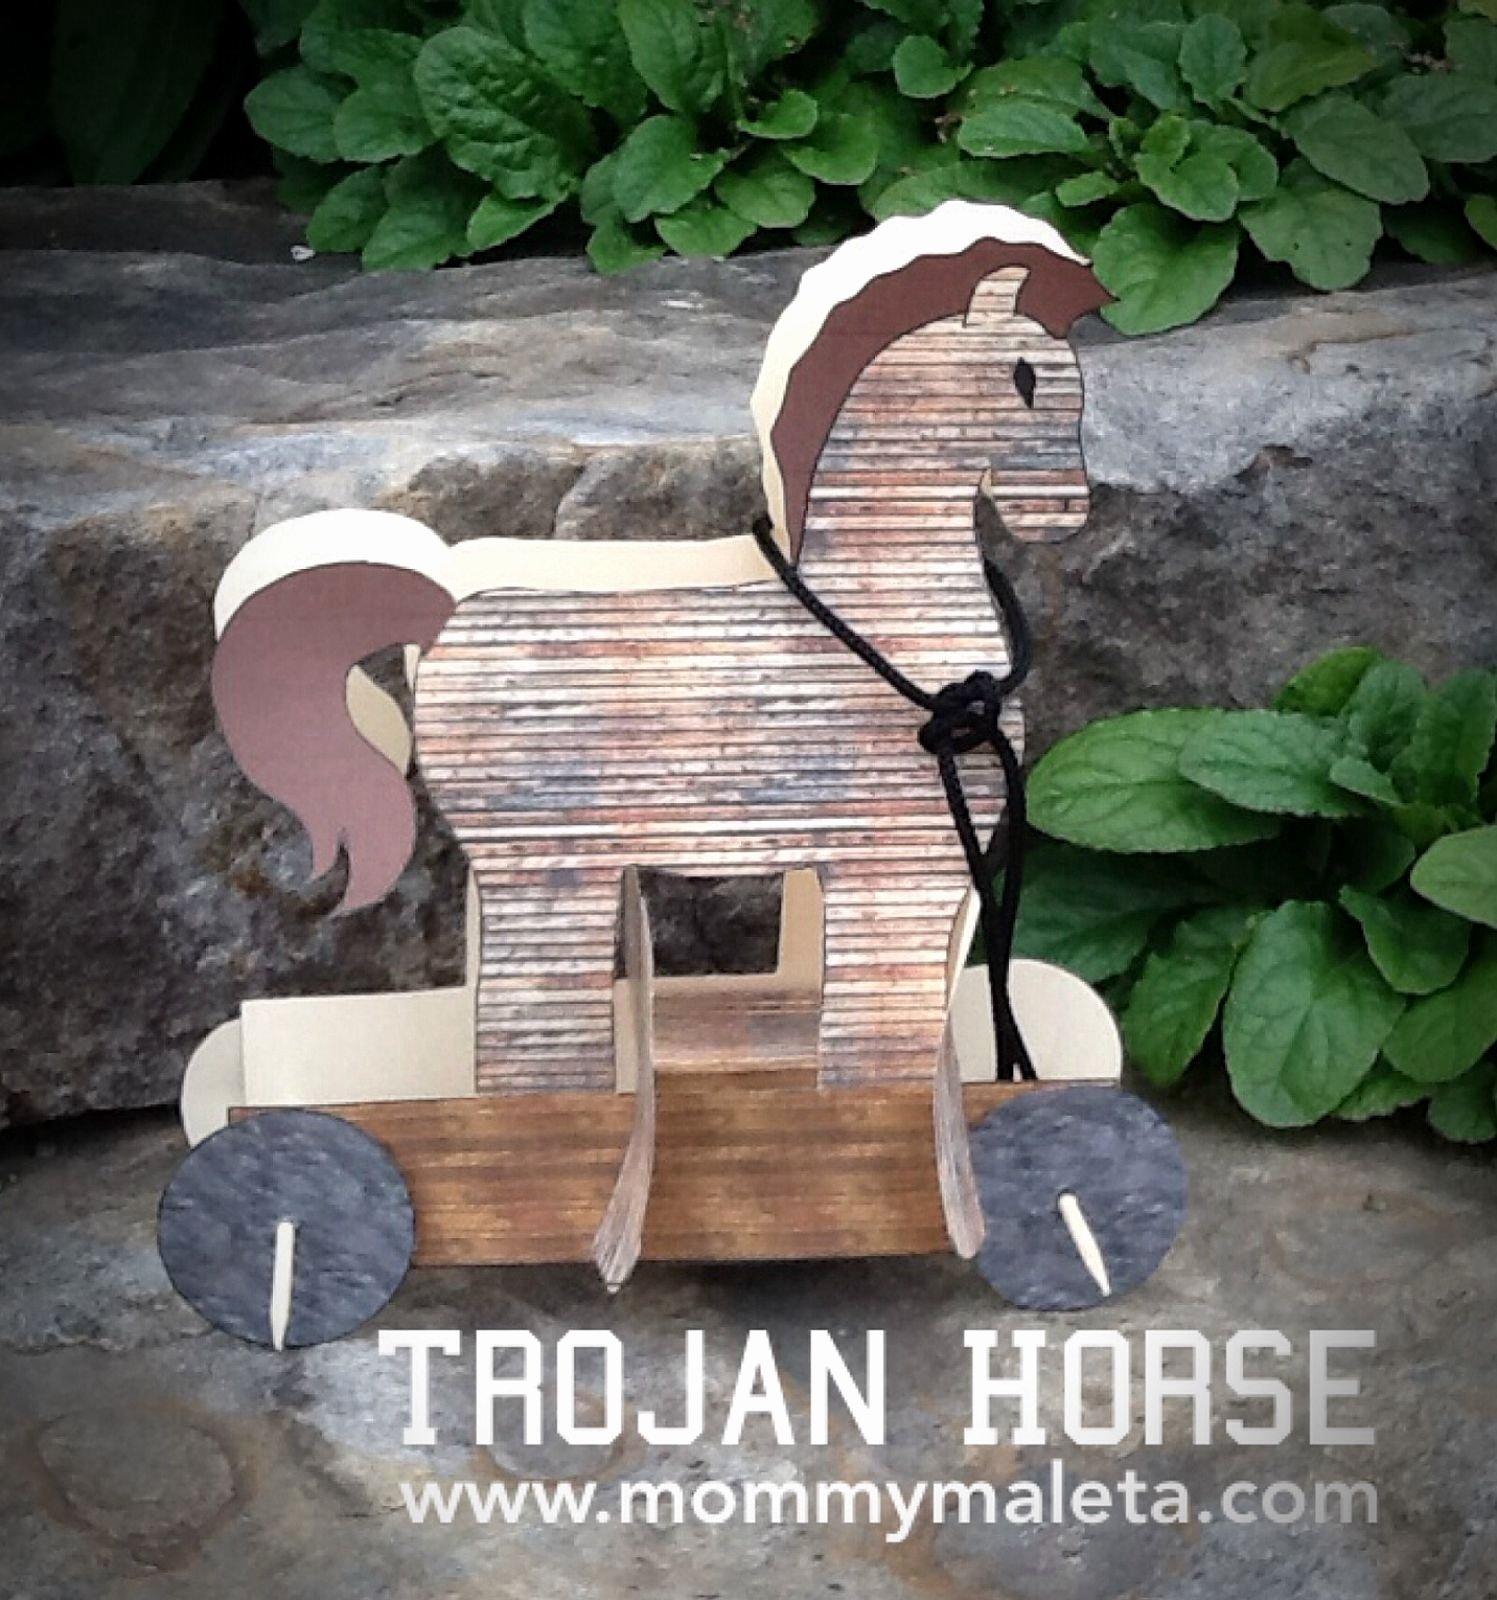 5 E's Lesson Plan Template Luxury Trojan Horse Craft